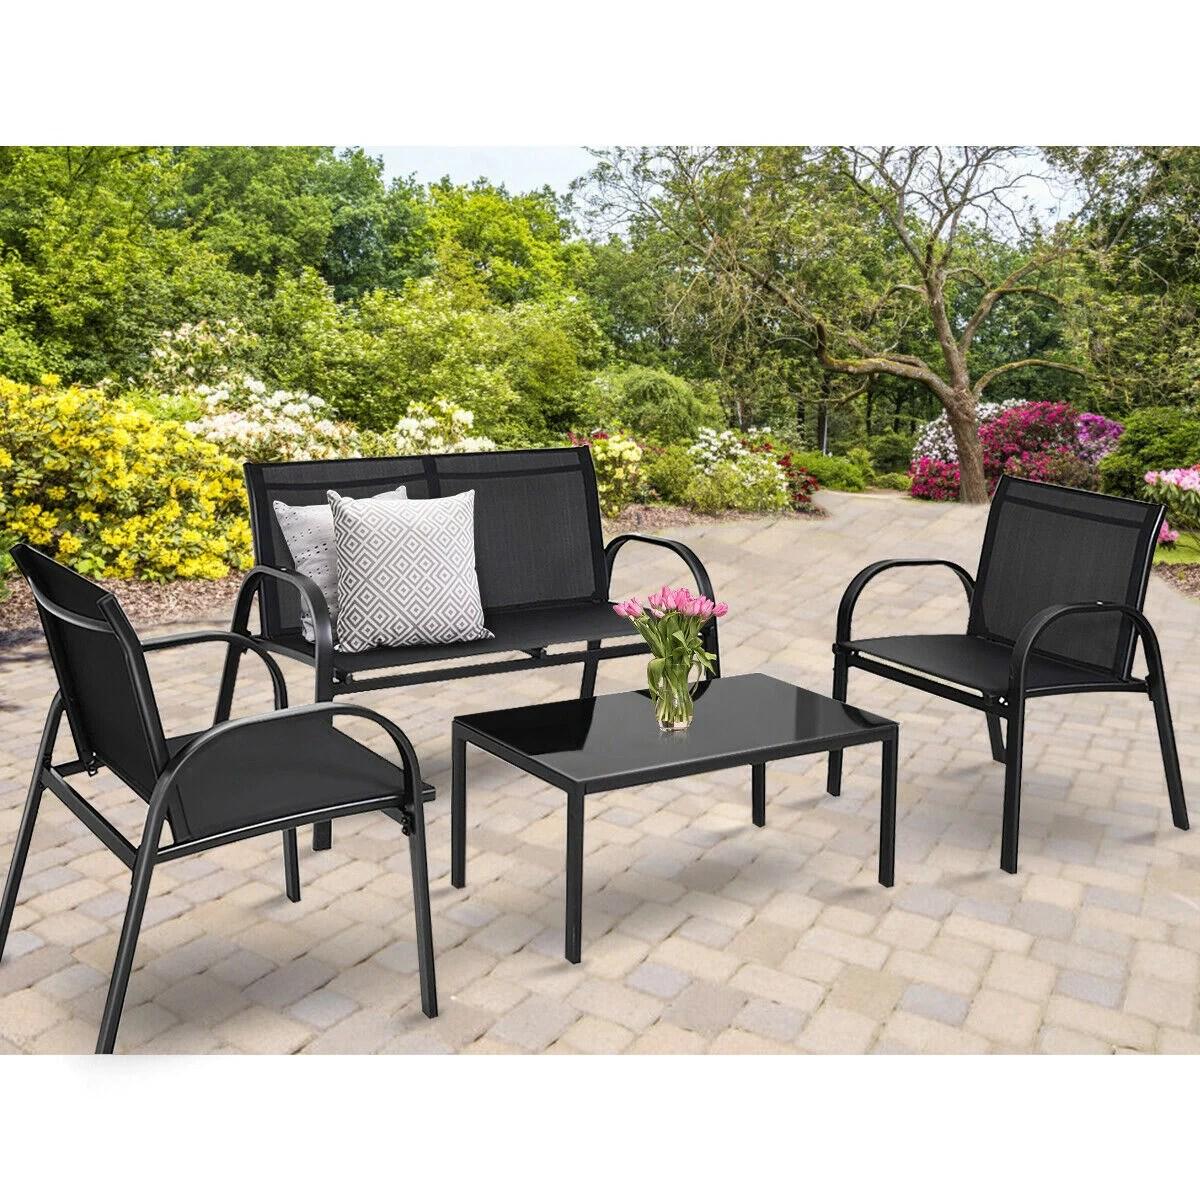 costway 4 pcs patio furniture set sofa coffee table steel frame garden deck black